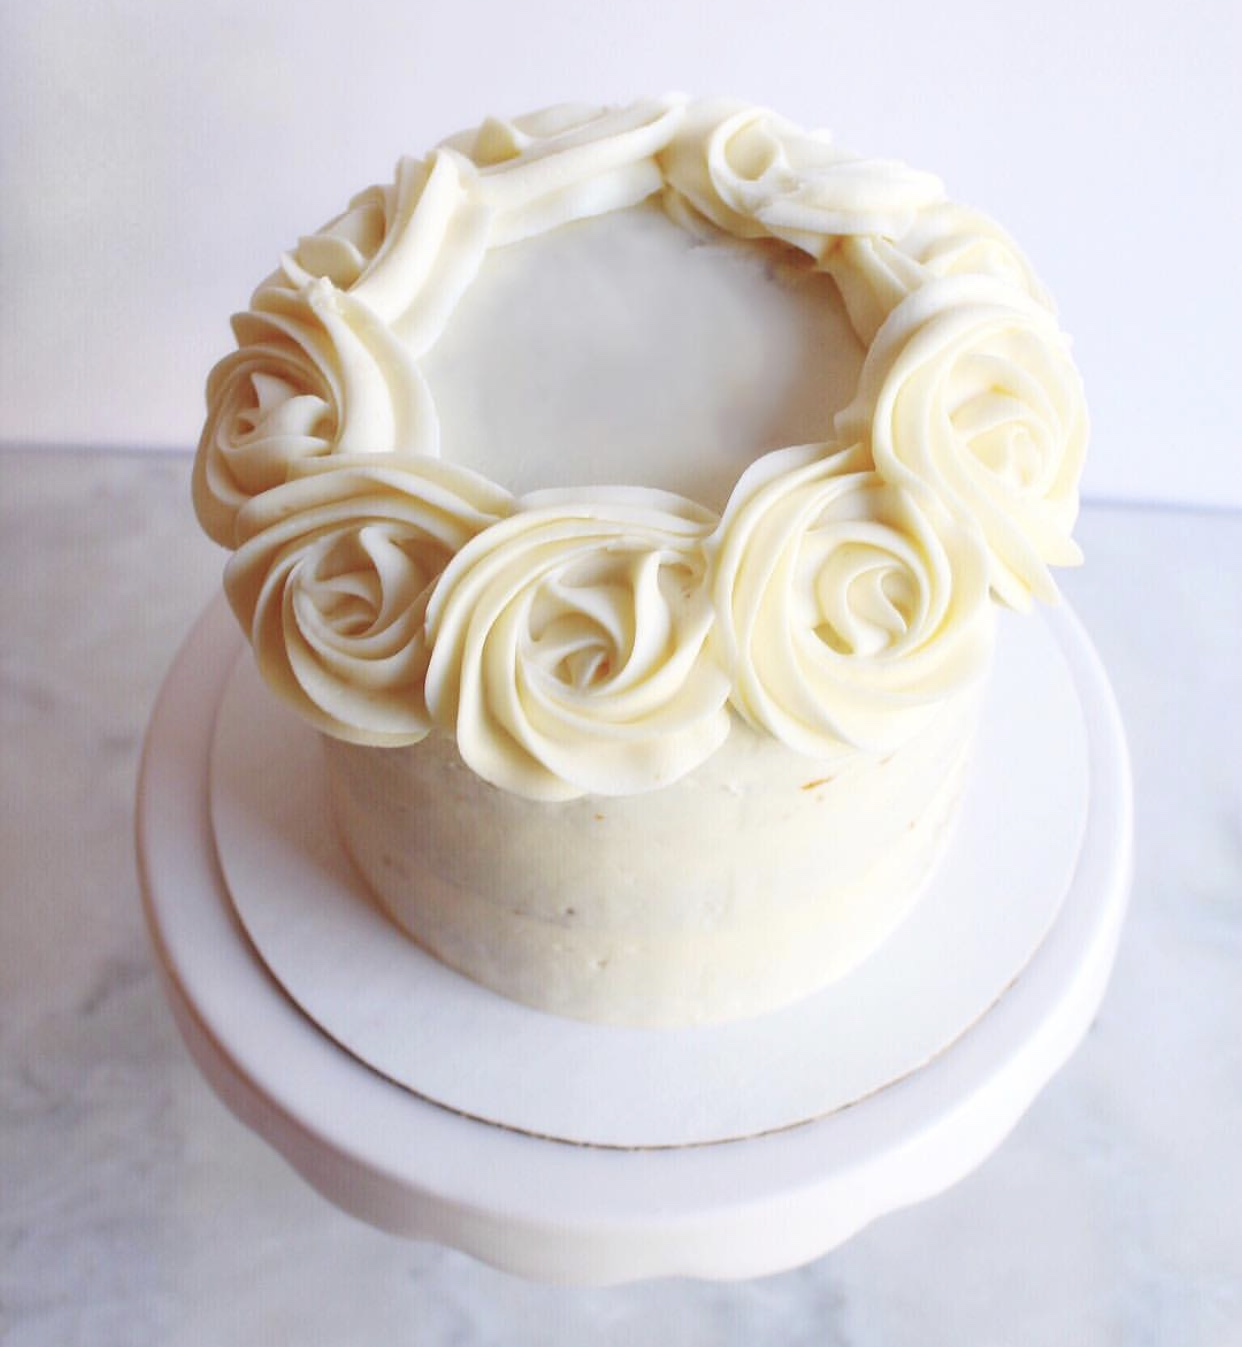 Nakupenda_Njeri_Cake1.jpg